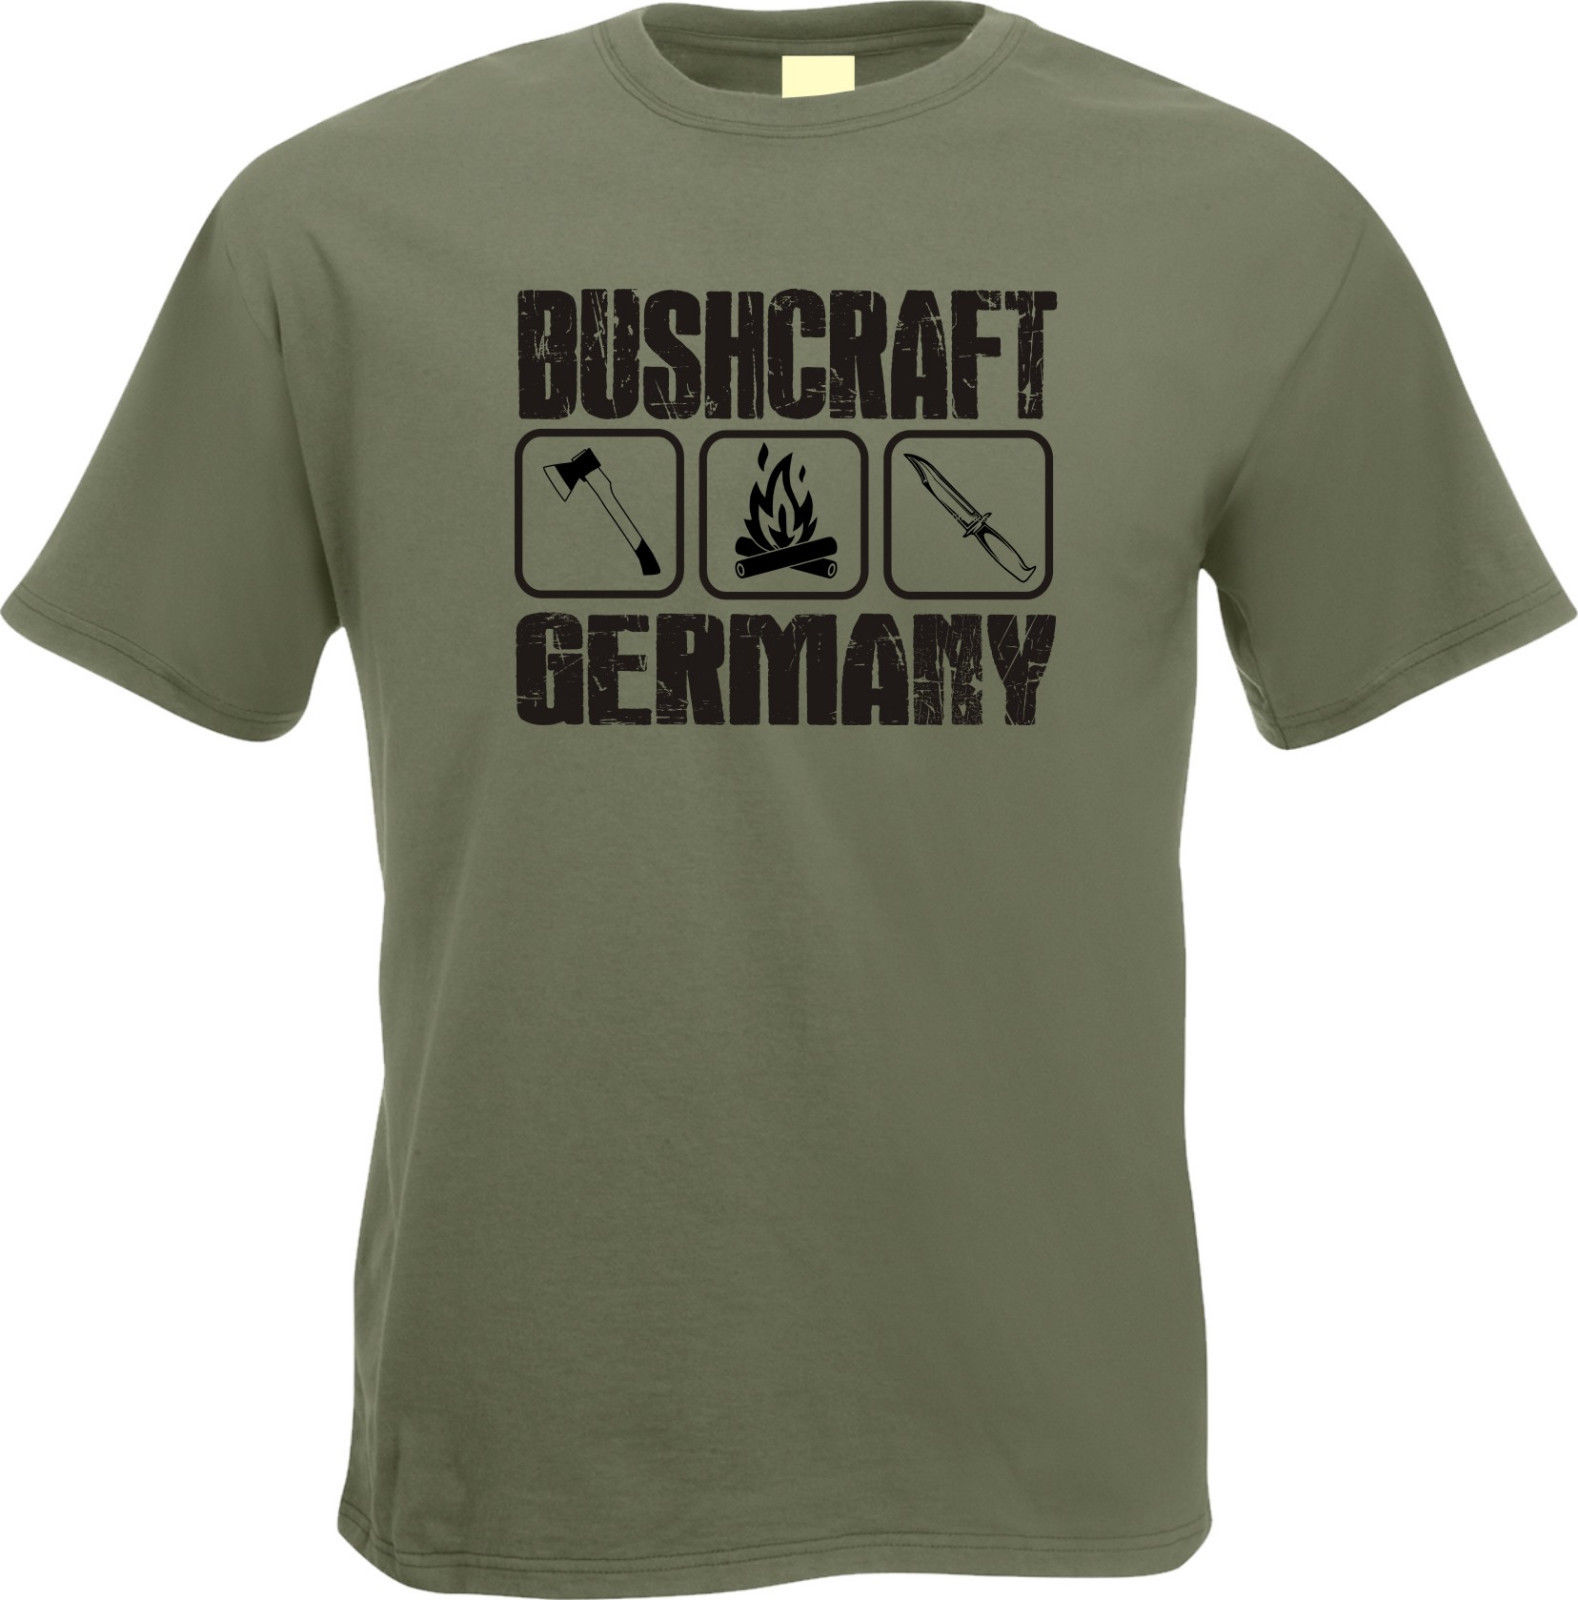 ❌ Bushcraft marcheurs T-shirt waldvolk édition limitée taille XL ❌